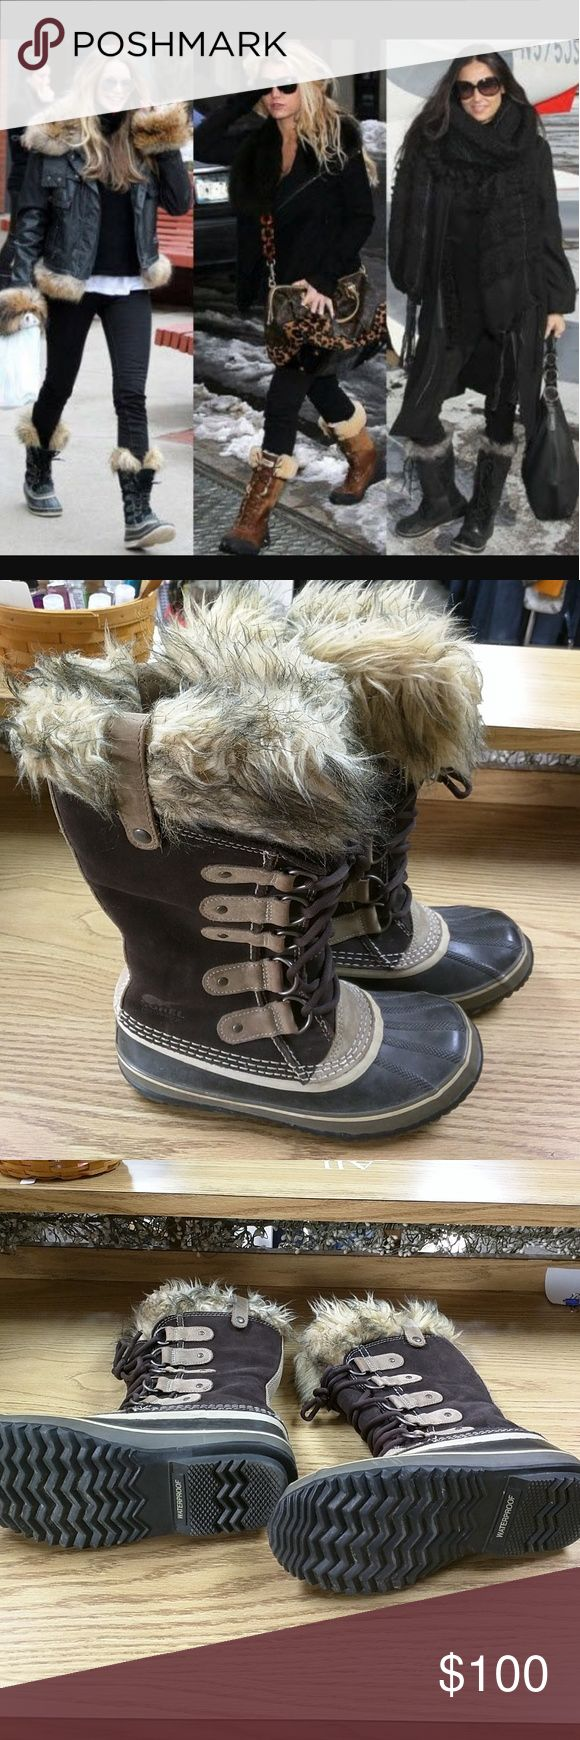 Joan of Arc Artic Boots Sorel Joan of Arc Artic Boots Size 7 Sorel Shoes Lace Up Boots